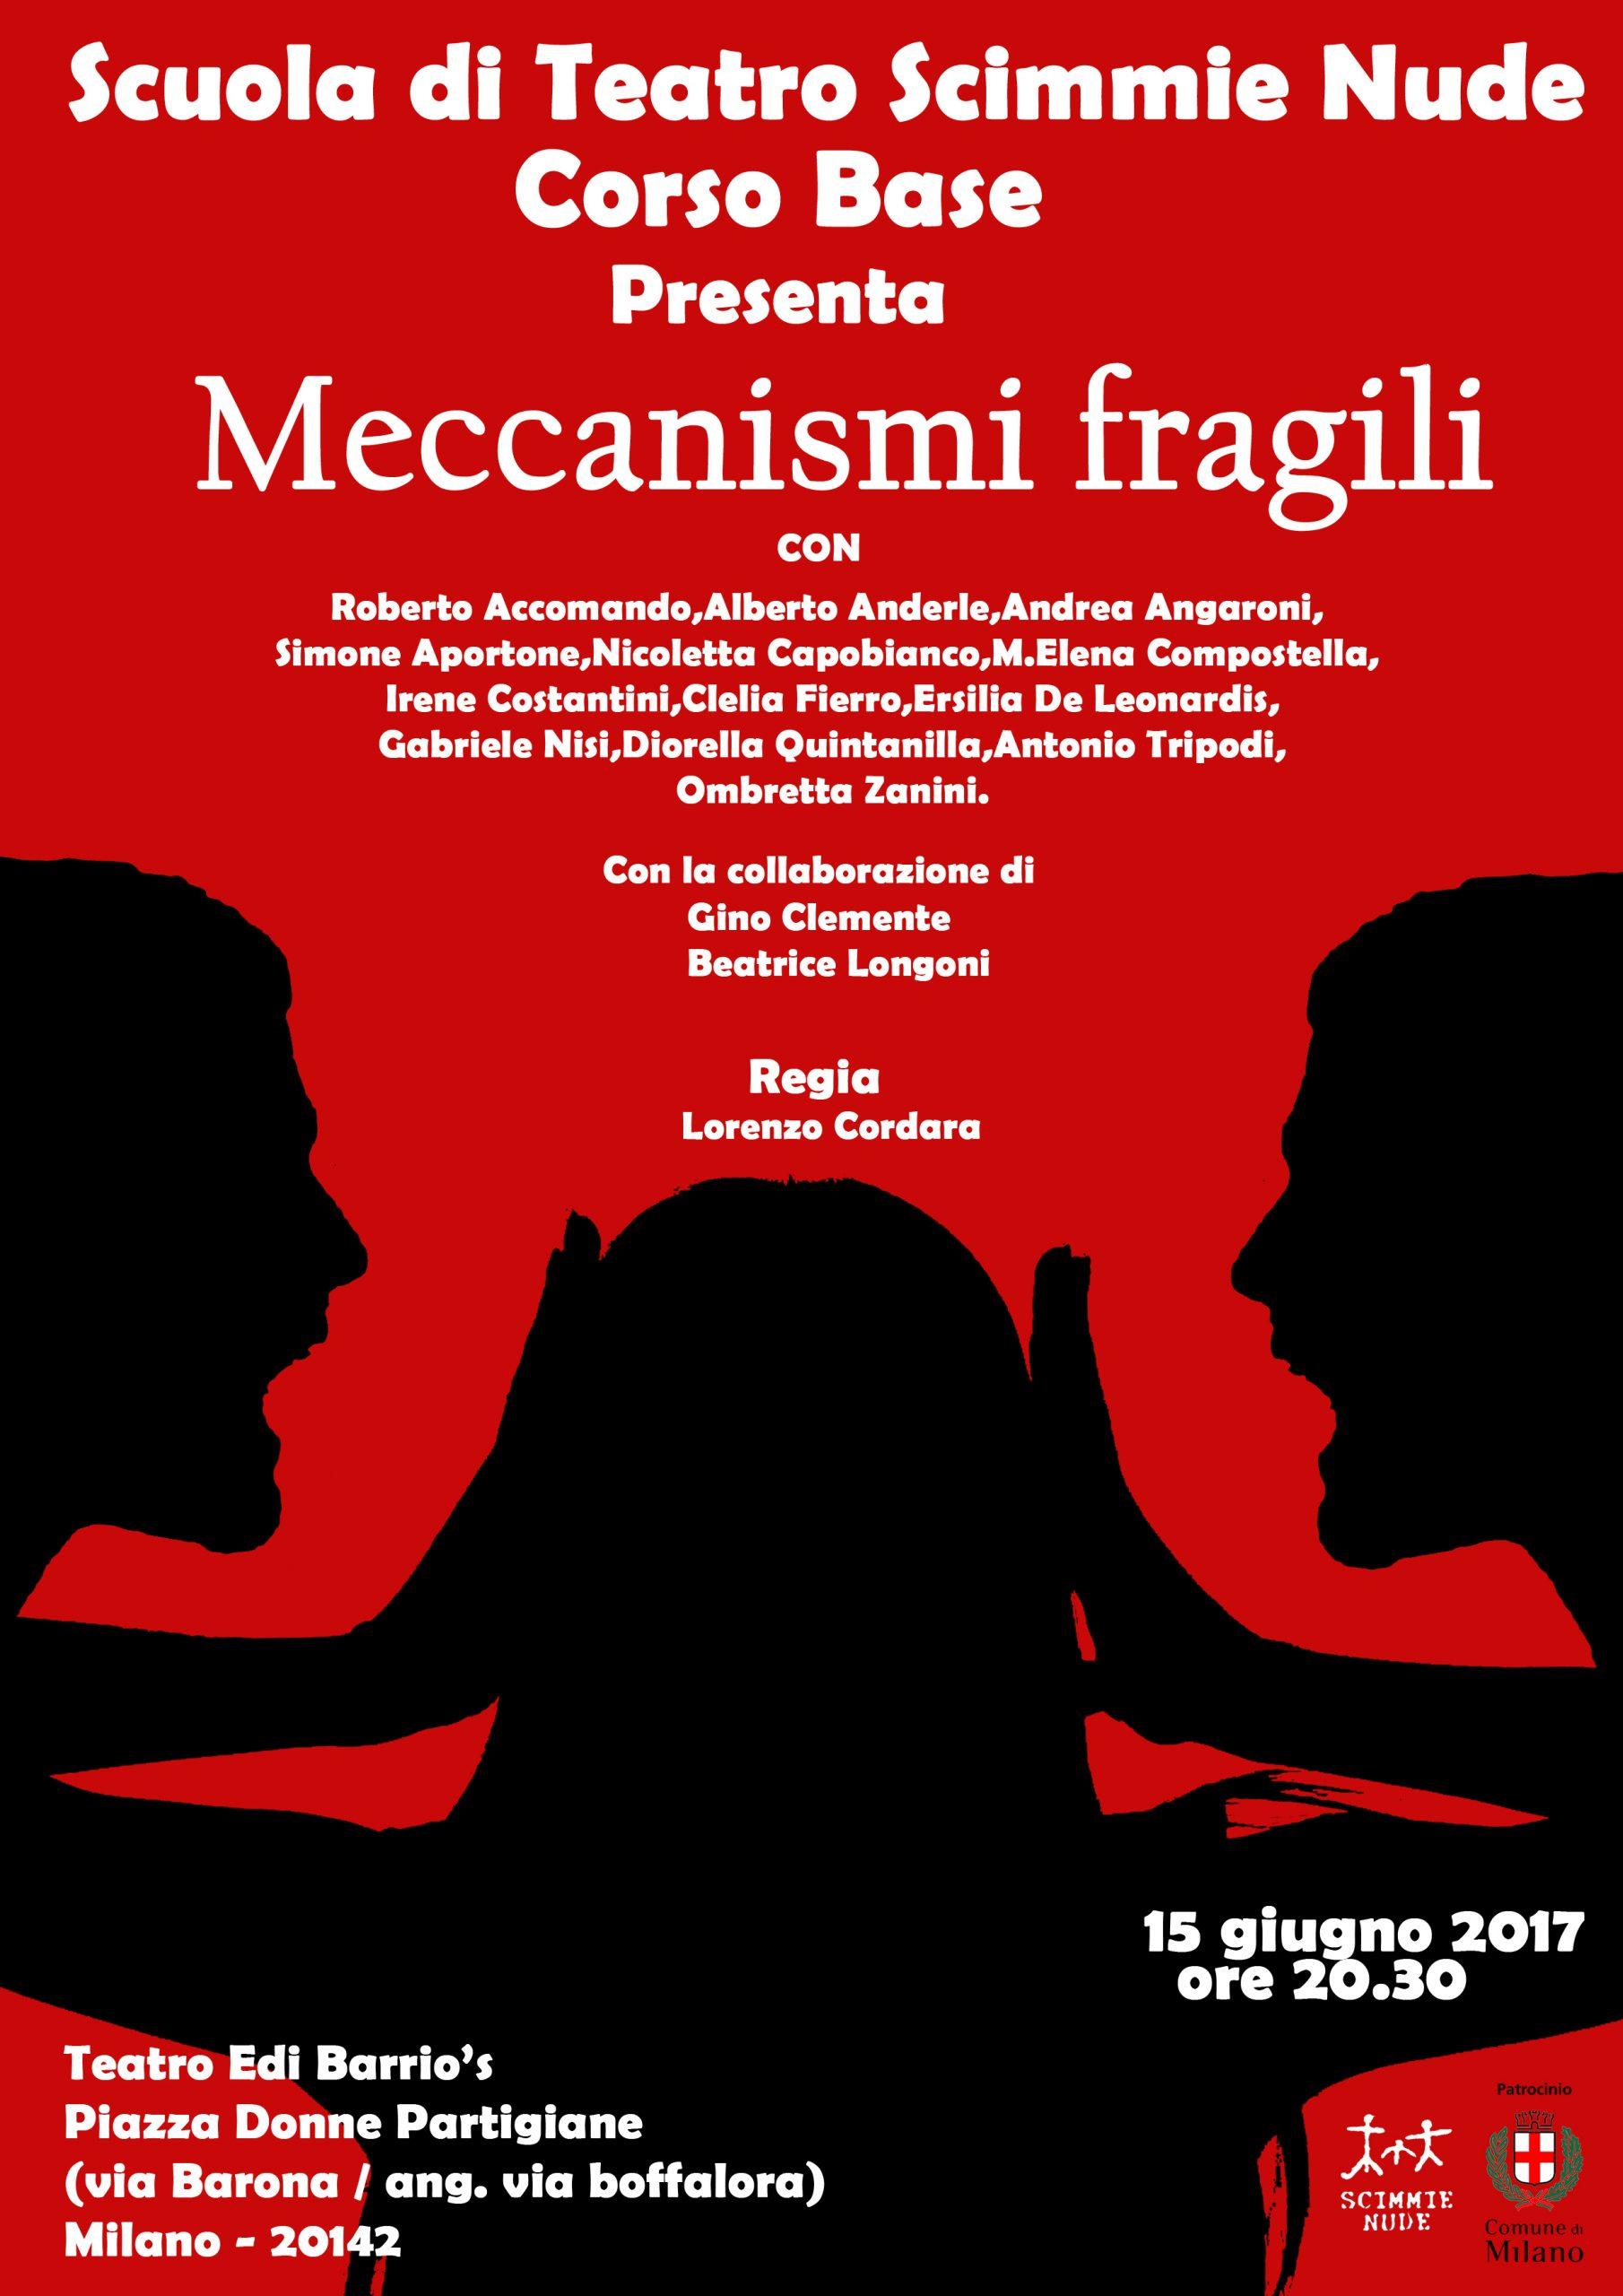 Loc-BASE-CORDARA_MECCANISMI-FRAGILI_2016-2017_Scimmie-Nude